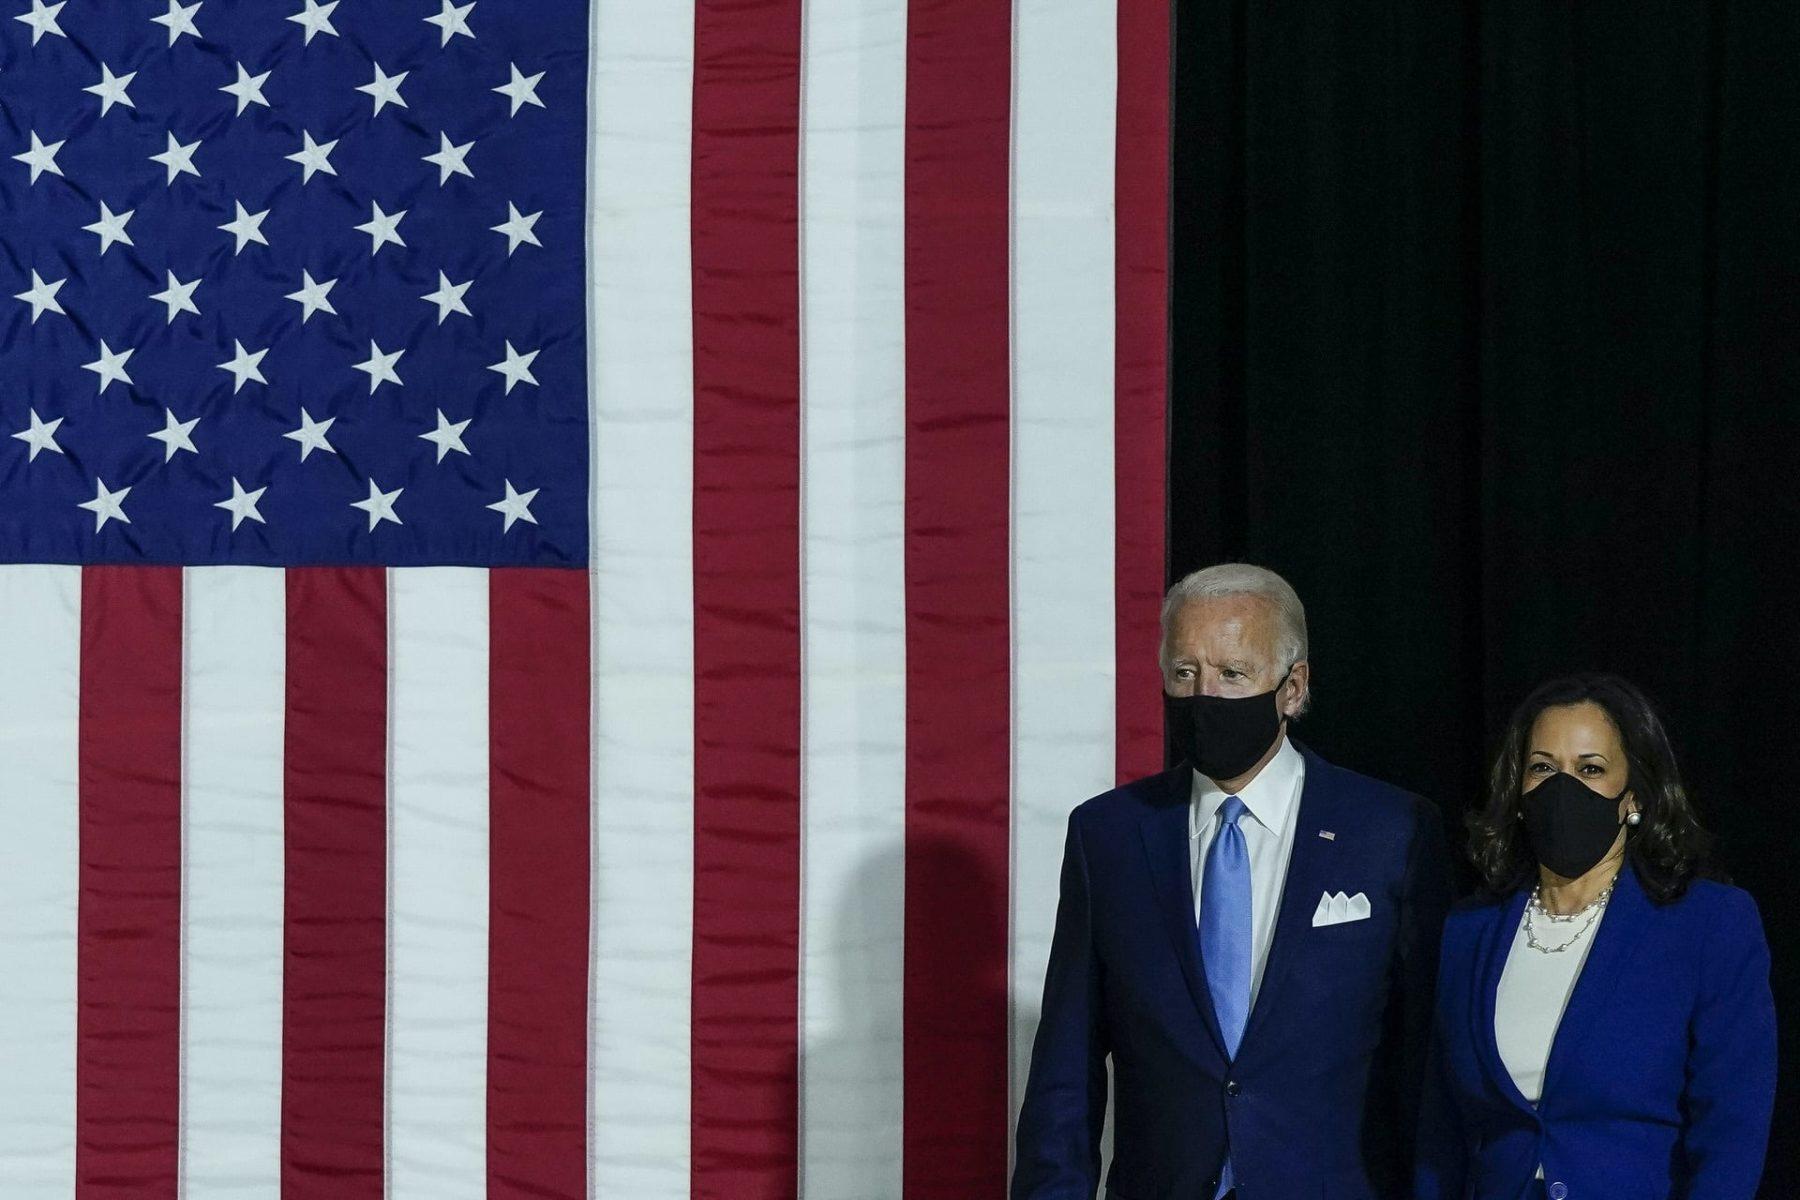 Joe Biden and Kamala Harris, both wearing masks, walk in front of an American flag.